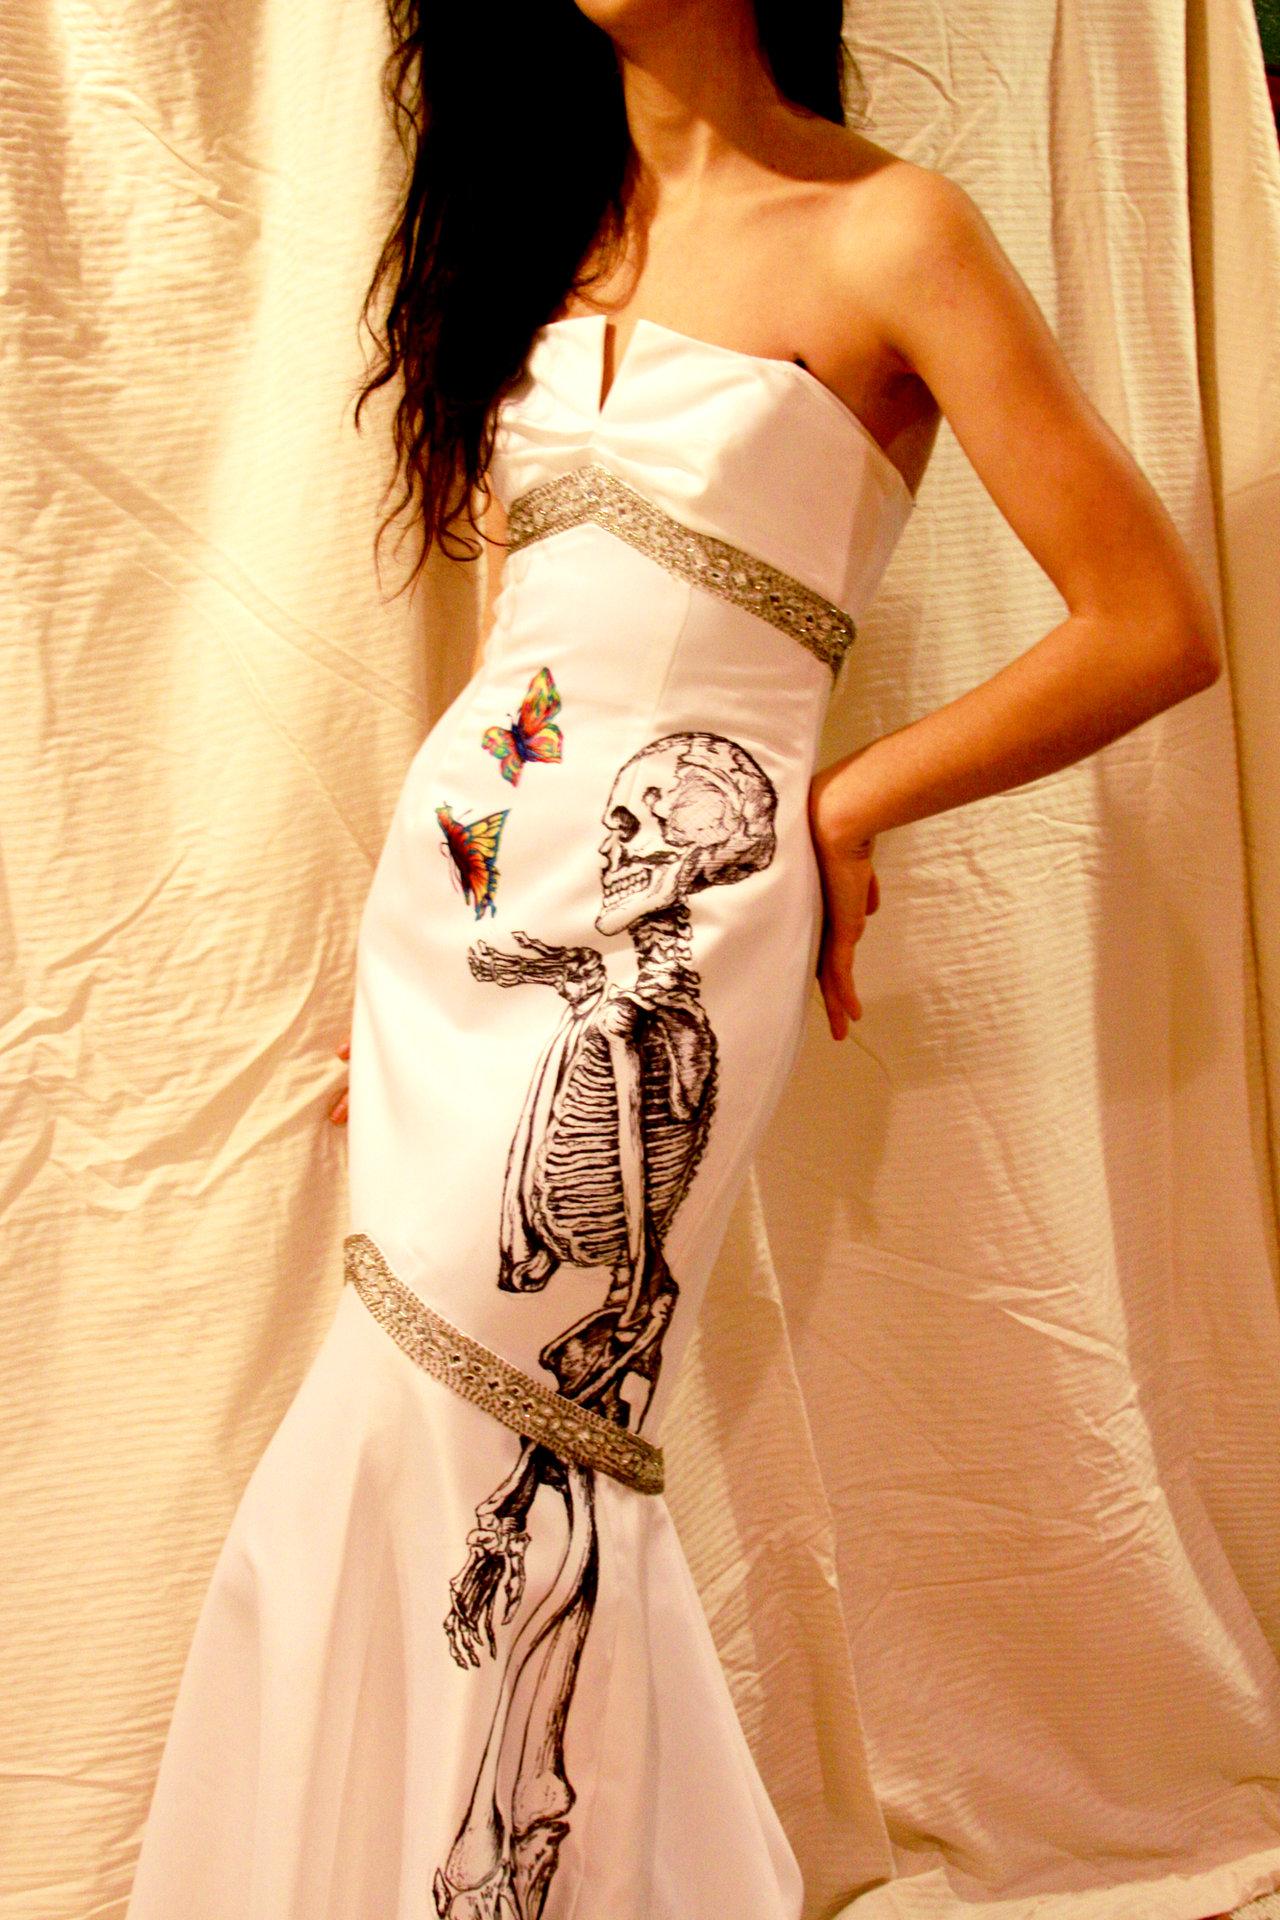 Drawn sleleton traditional Hand Dress Skeleton  Mermaid